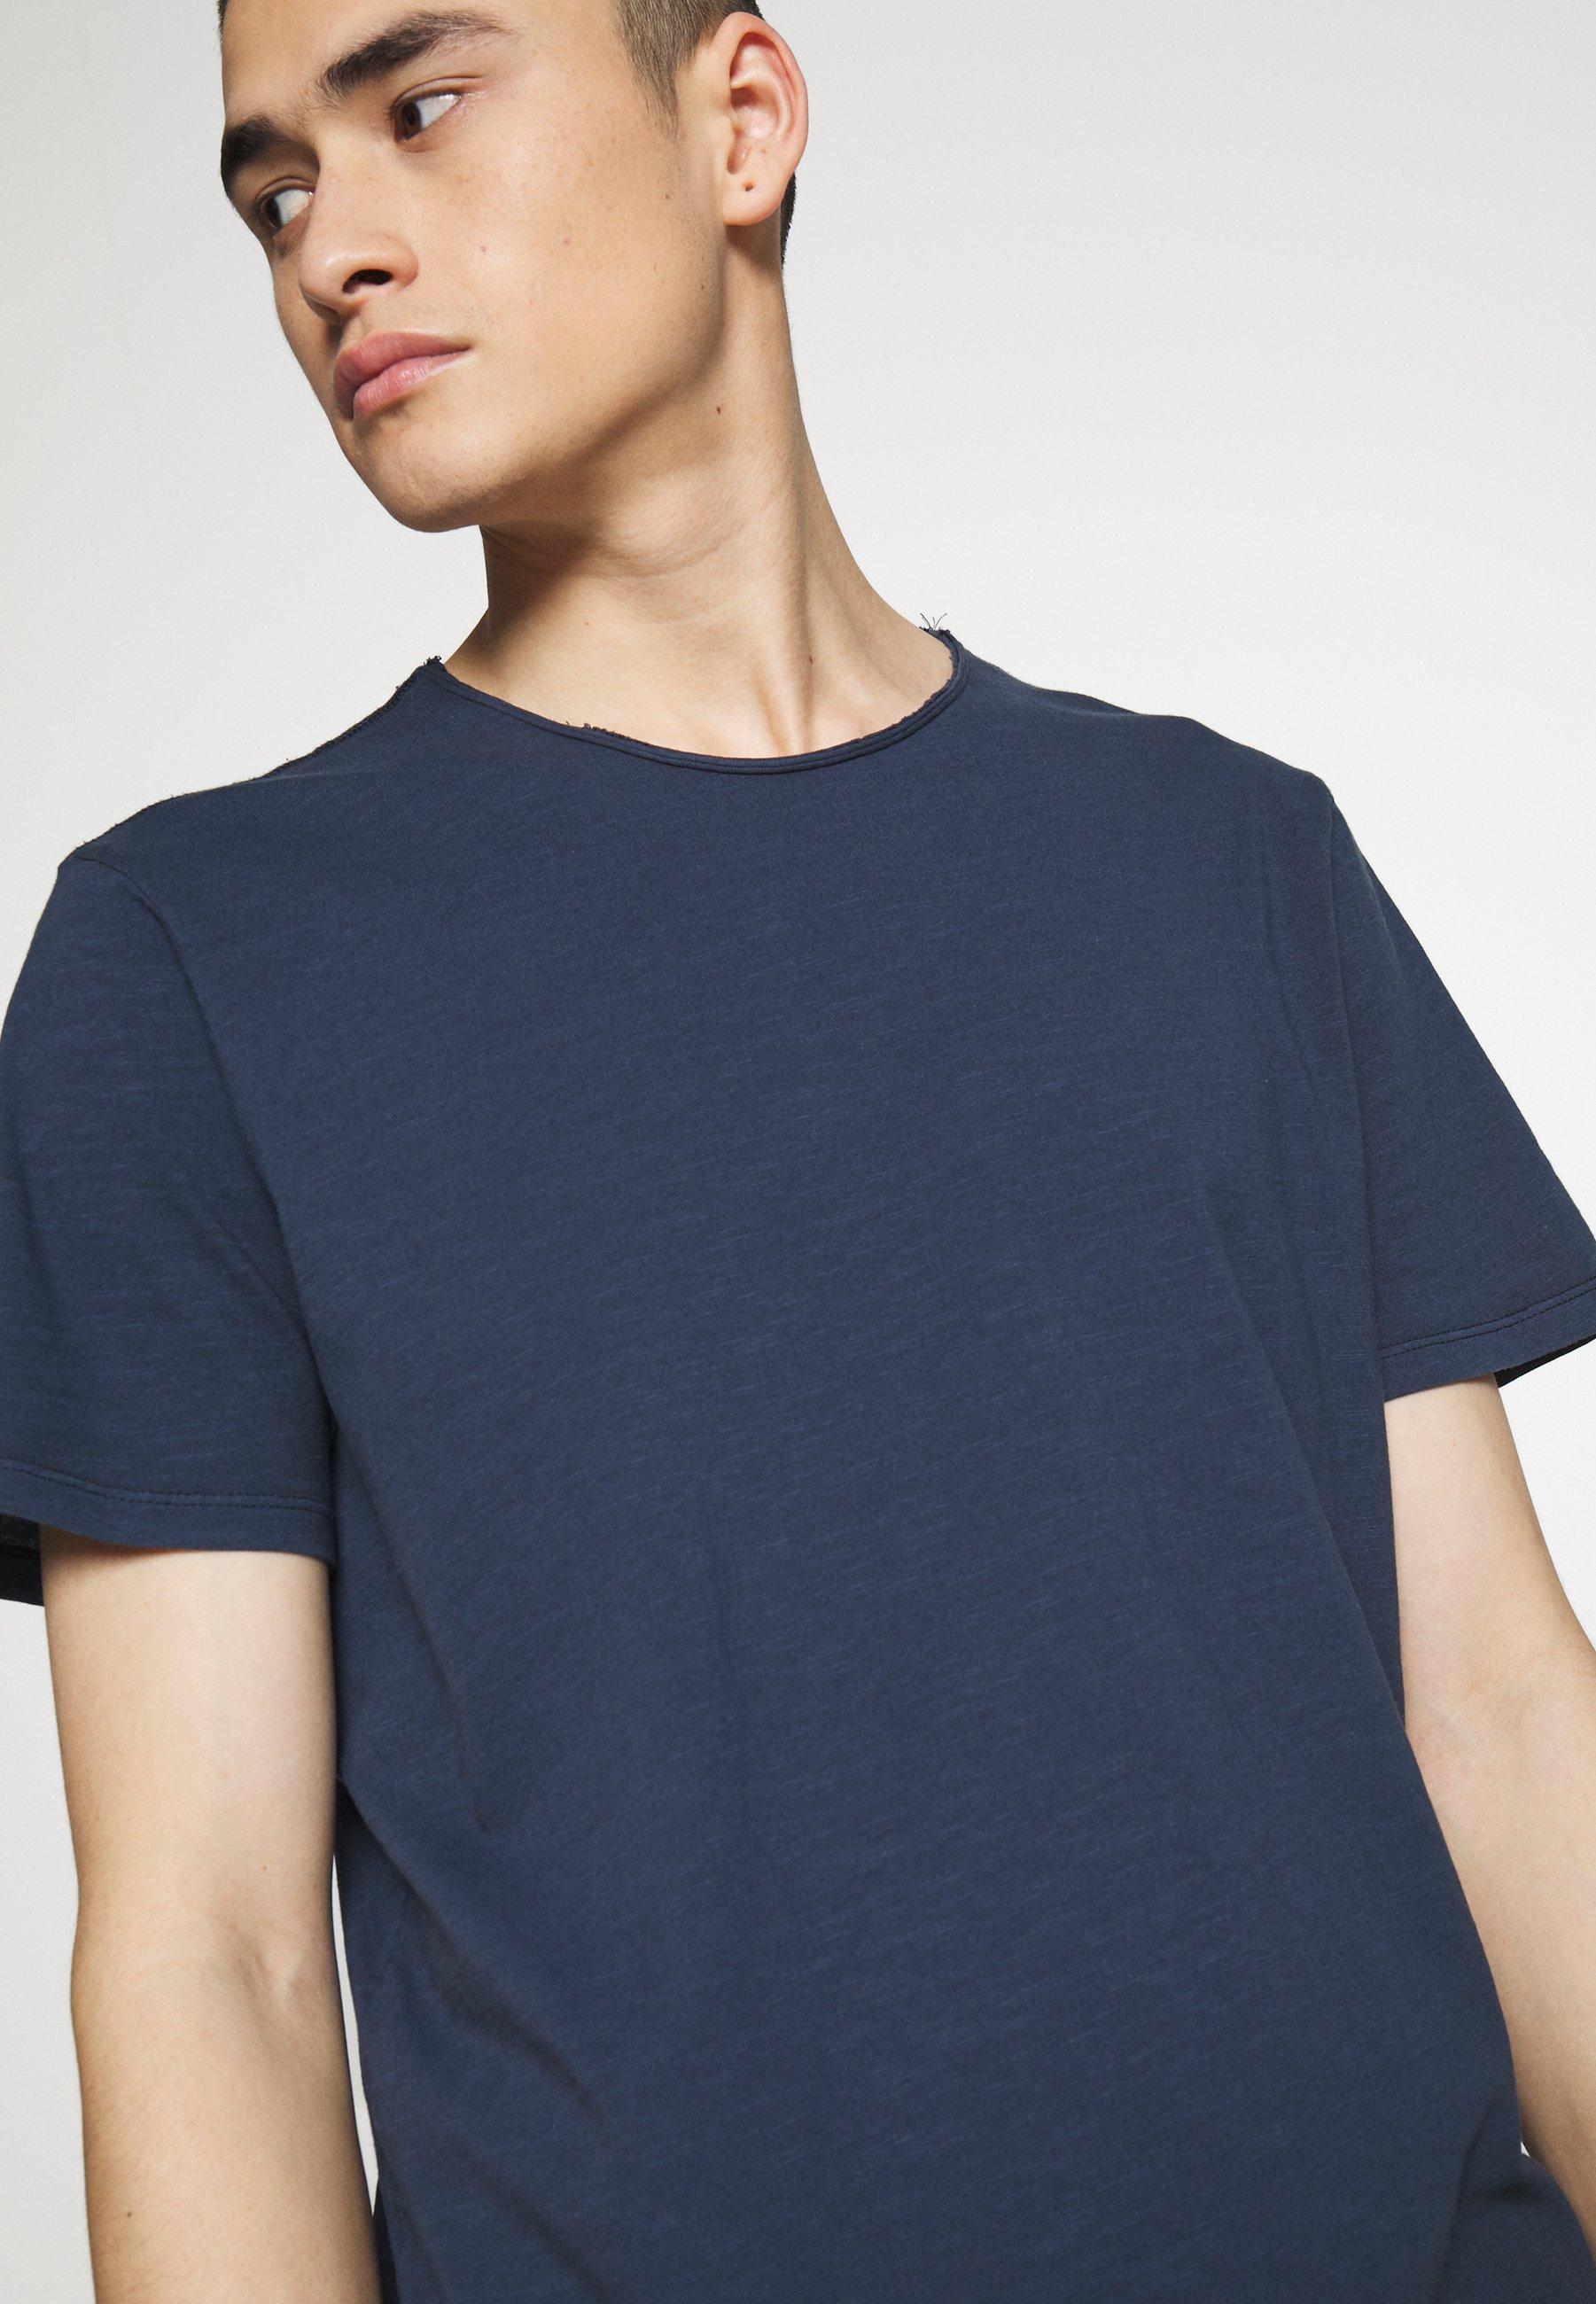 Jack & Jones PREMIUM JJEASHER TEE O-NECK NOOS - Basic T-shirt - navy dnjEU